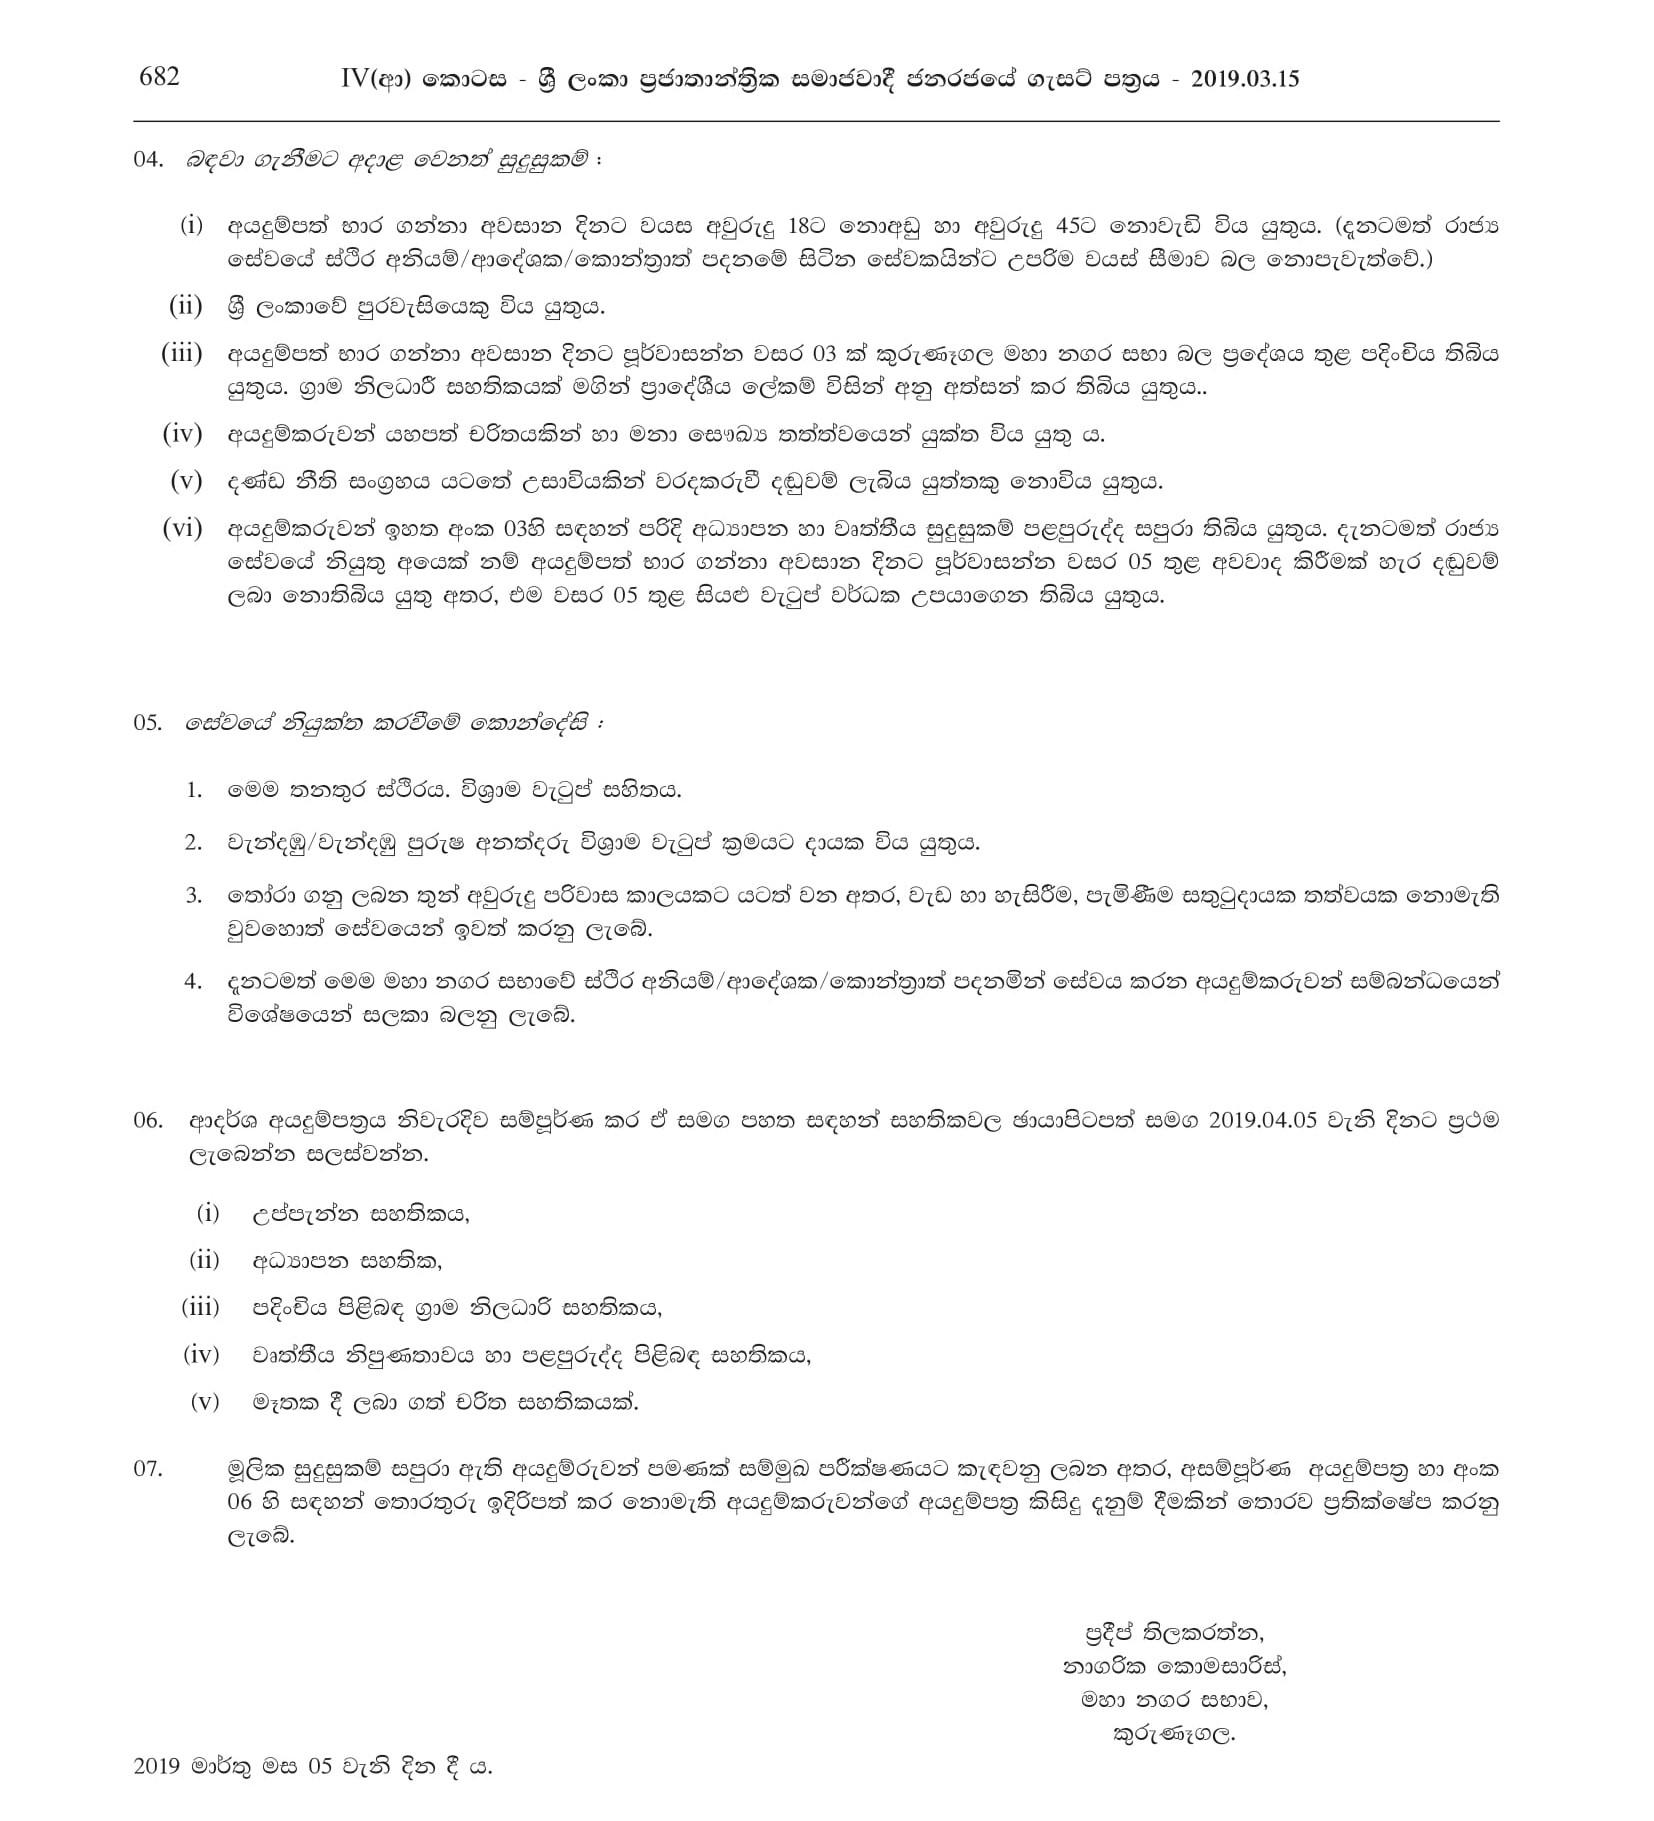 Office Assistant, Library Attendant, Driver, Water Treatment Plant Technician, Water Machine Operator, Mason, Blacksmith, Field/Working Labour - Kurunegala Municipal Council